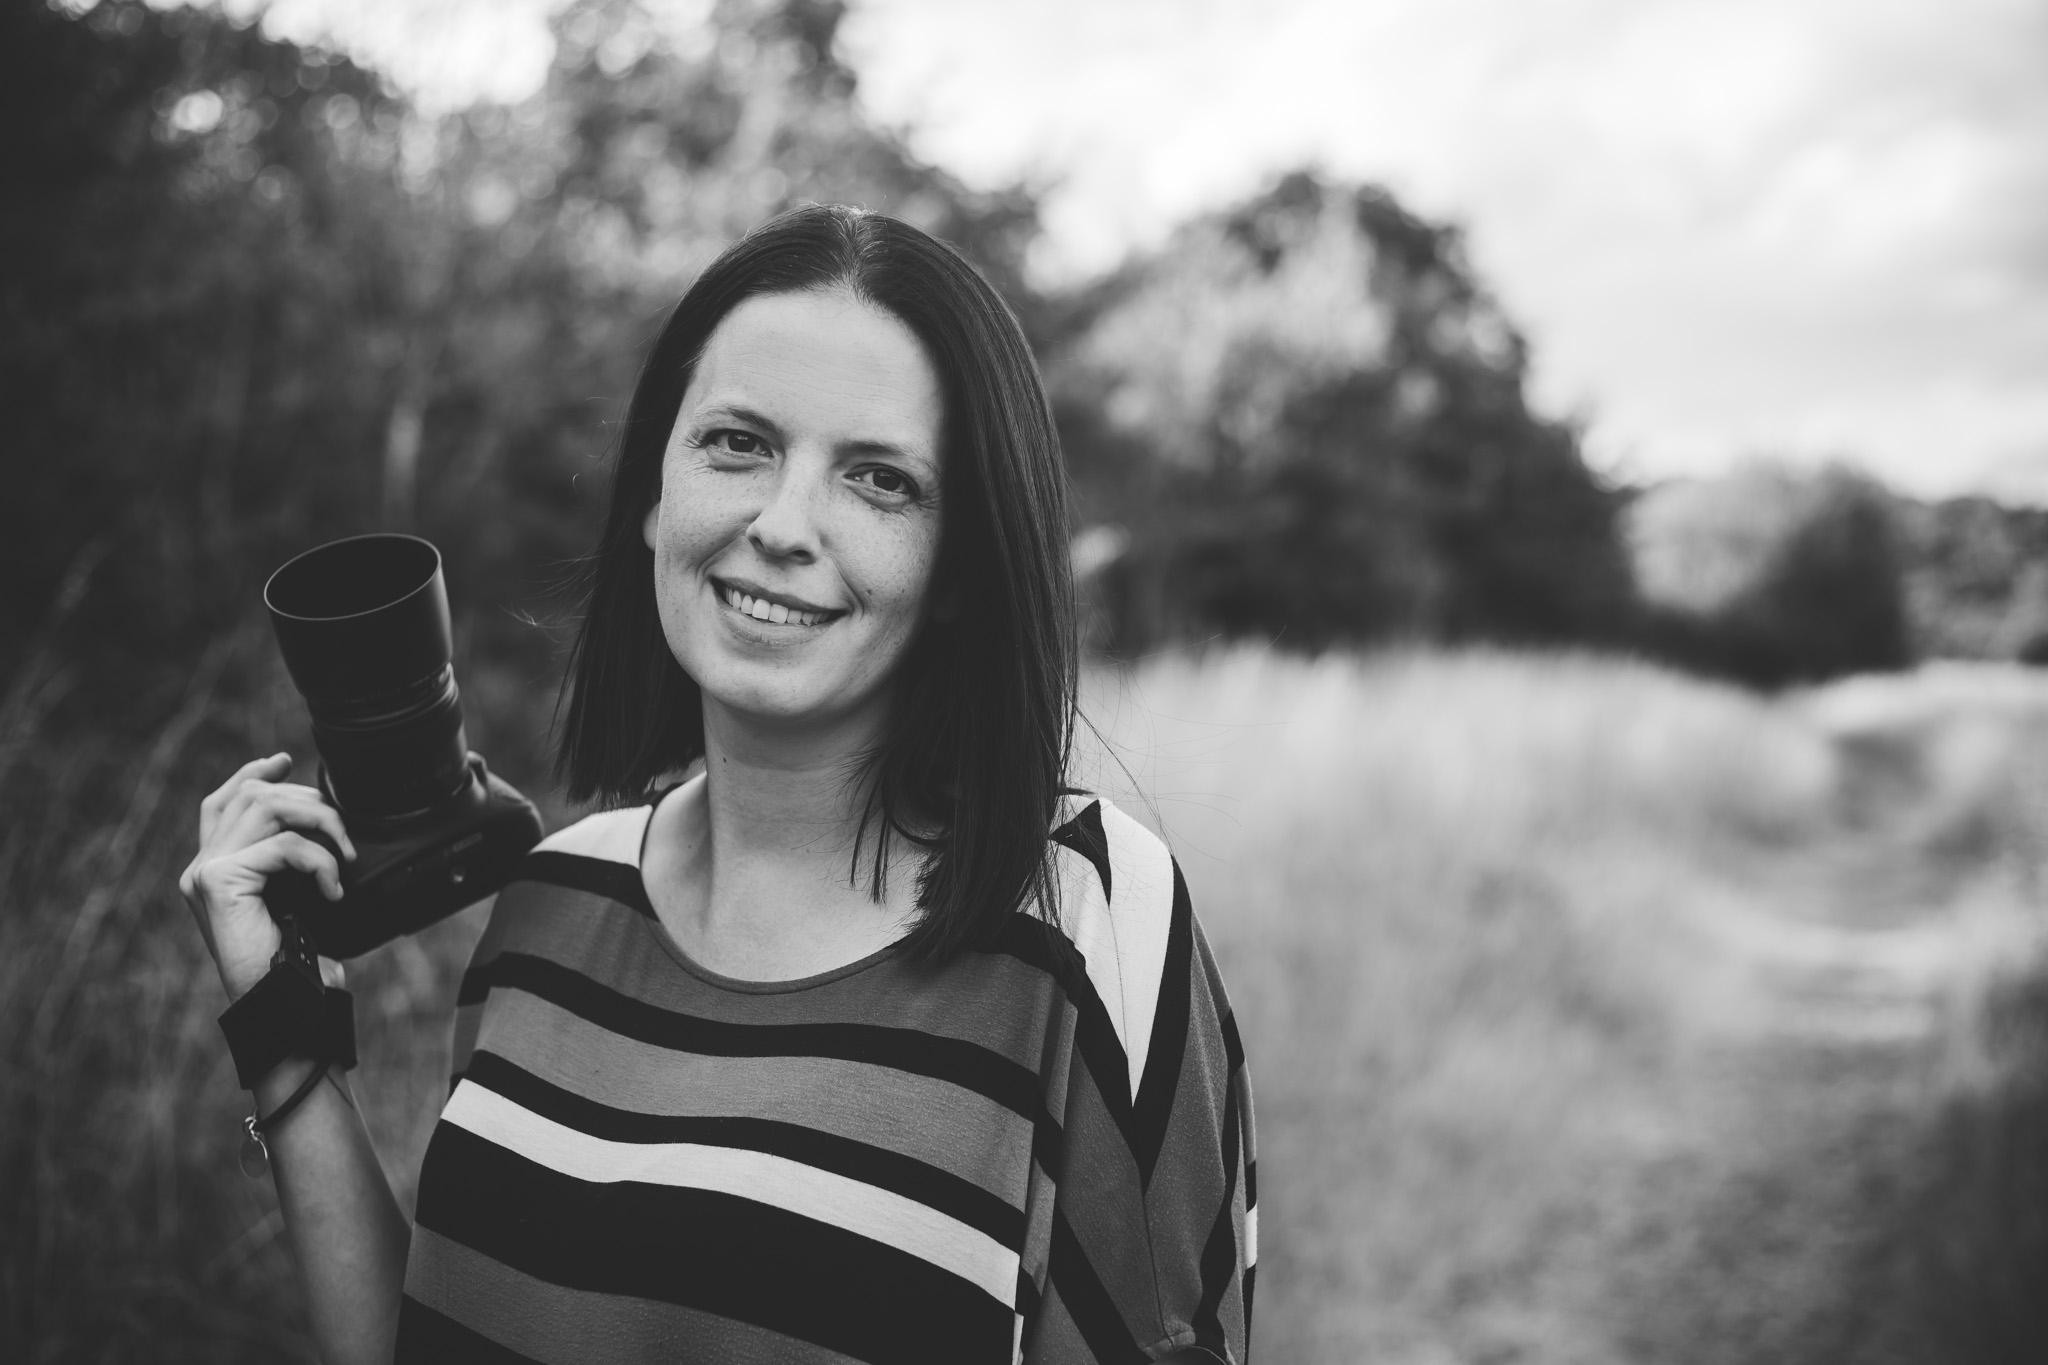 Debbie Dee - Debbie Dee Photography - Newborn & Family Photographer in Aberdeen, Huntly, Aberdeenshire and Moray